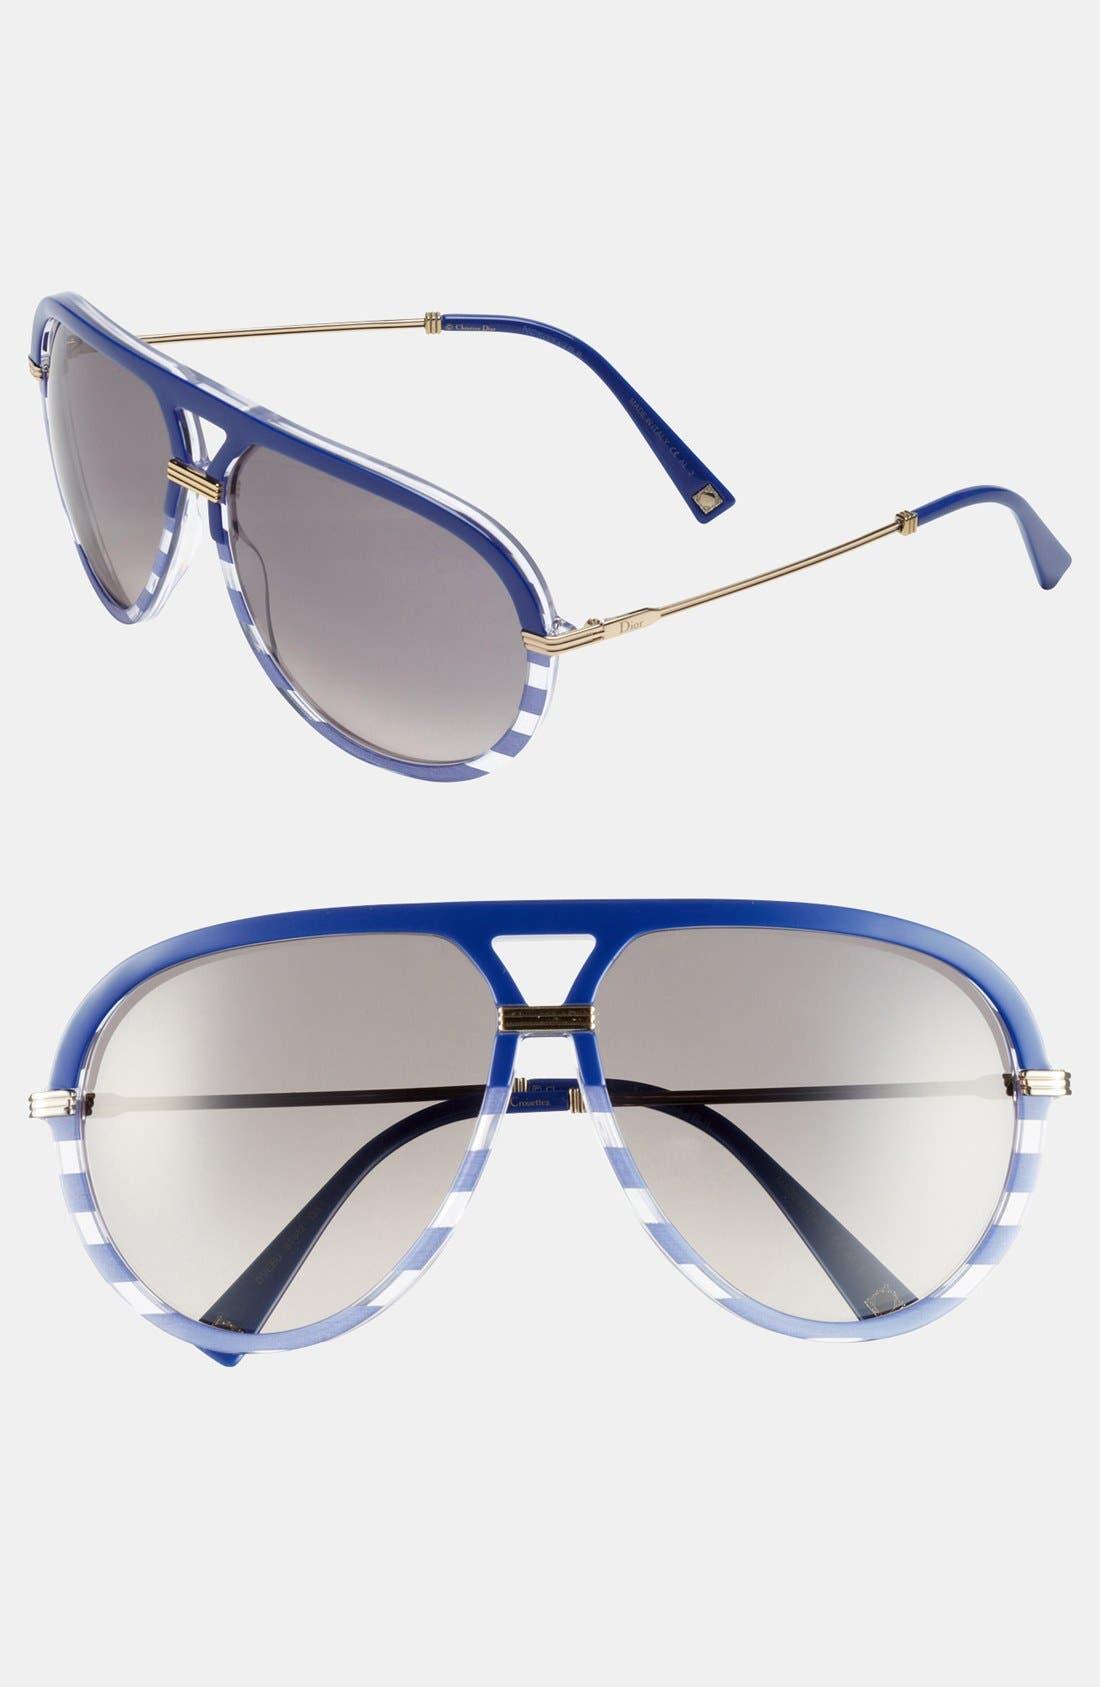 Main Image - Dior 'Croisette 2' Aviator Sunglasses